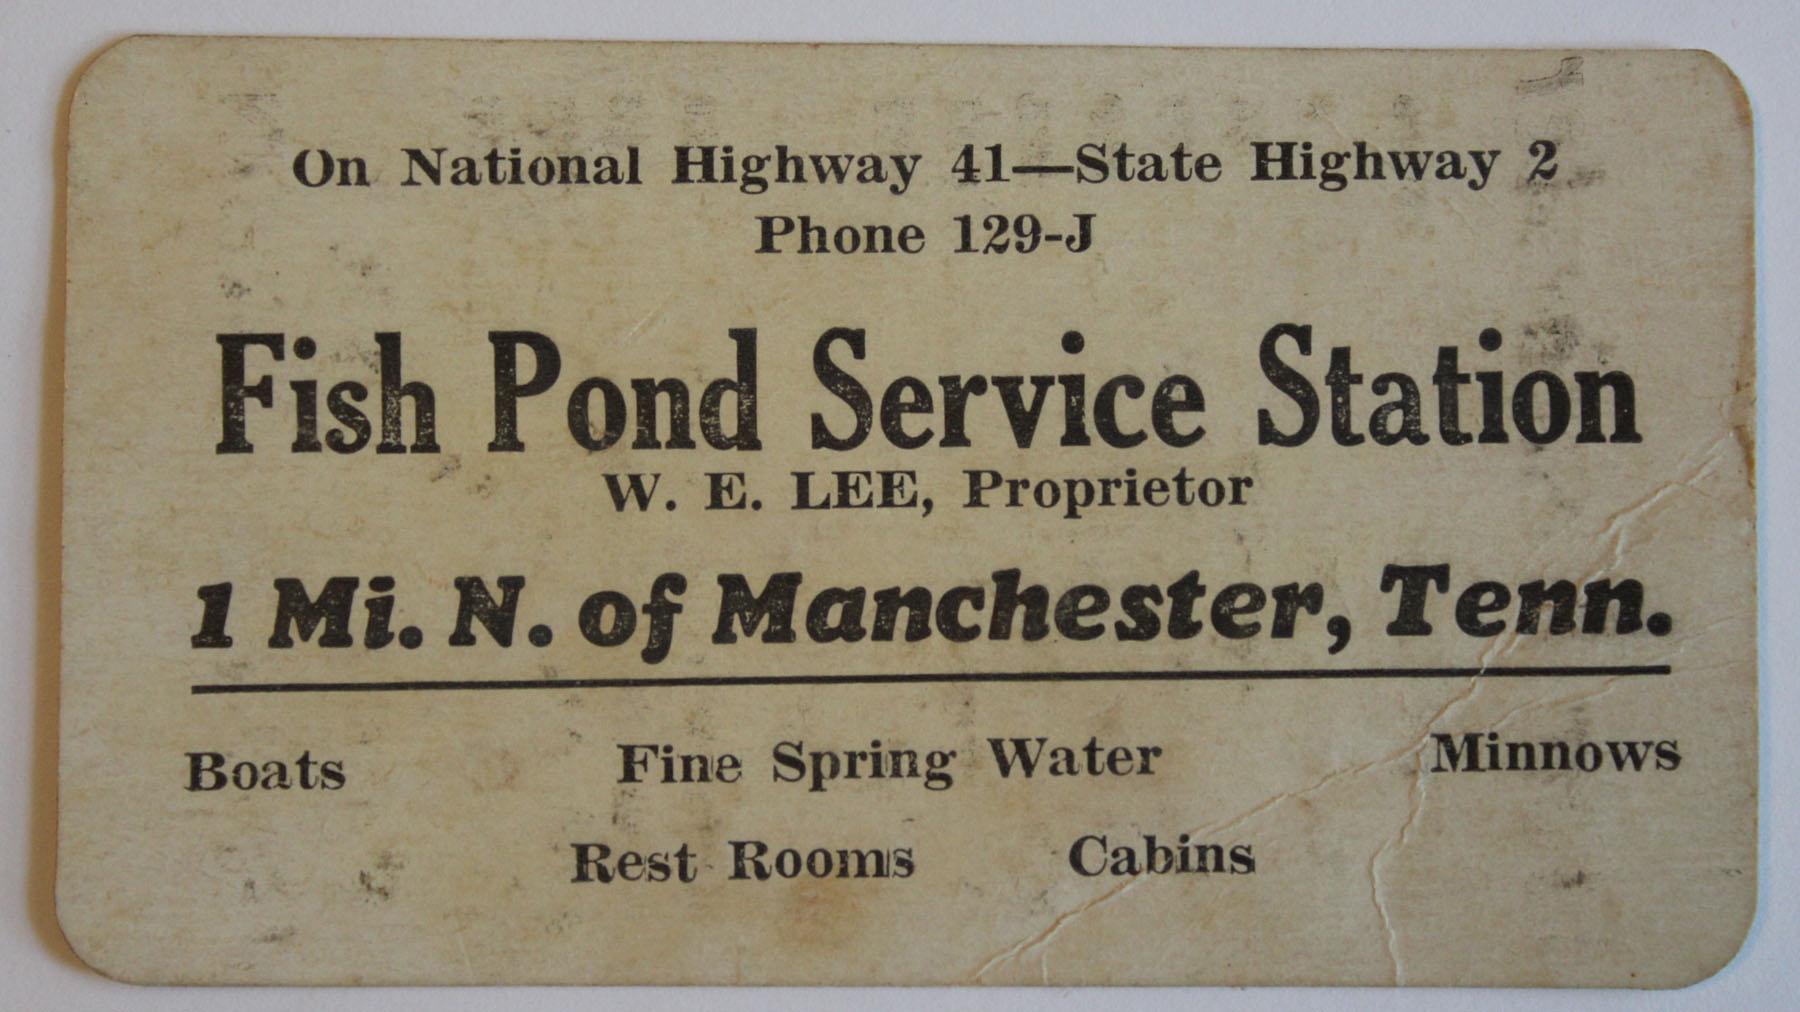 1940s Manchester, TN Post Cards & Business Cards | busybeetraveler